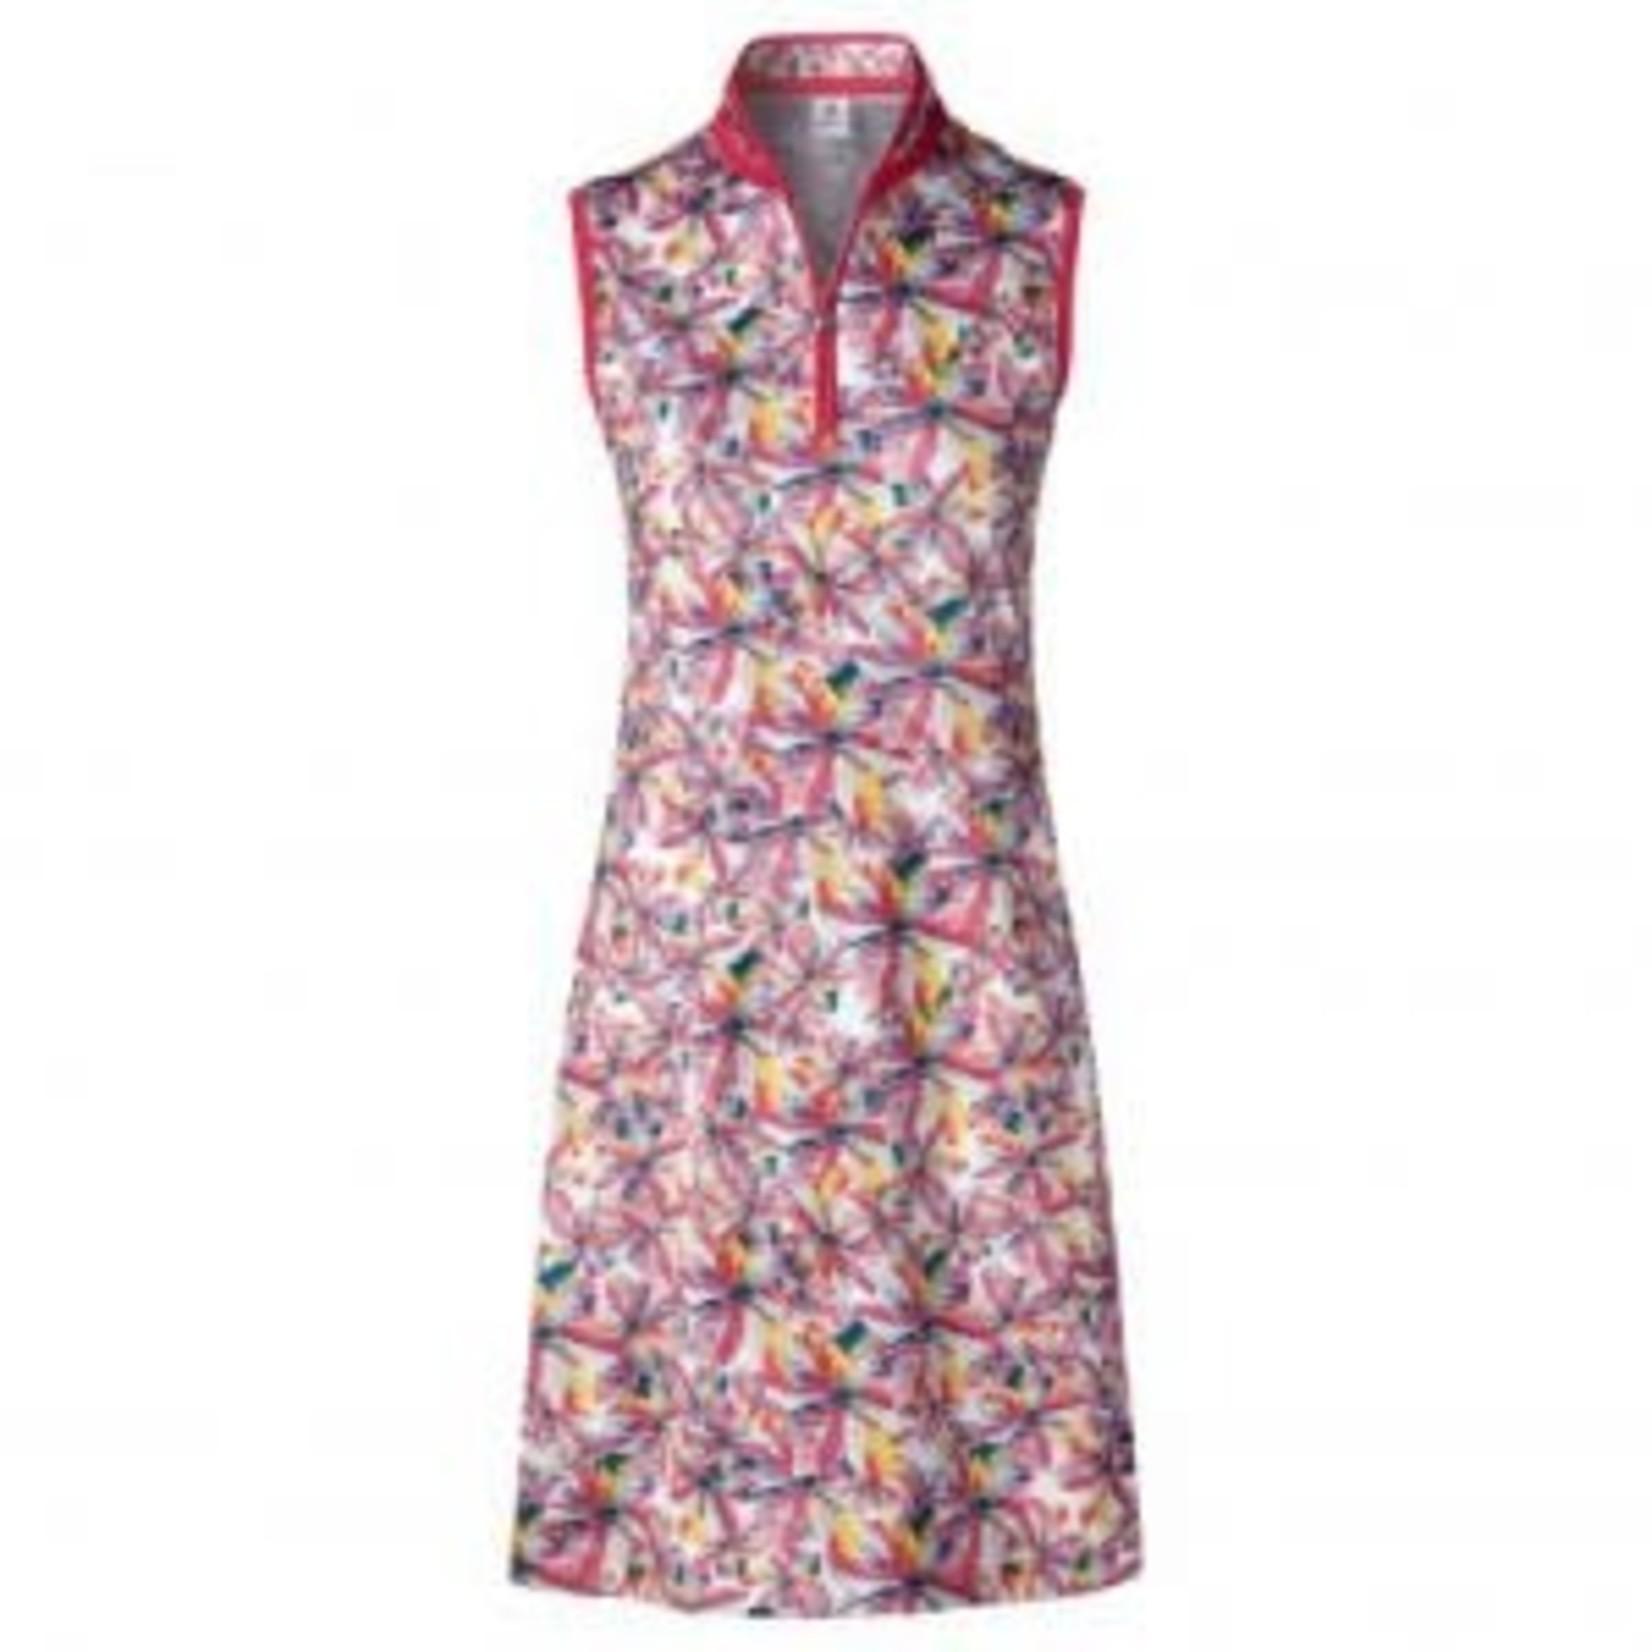 Daily Sports Daily Sport Rickie S/L Dress sangria XL